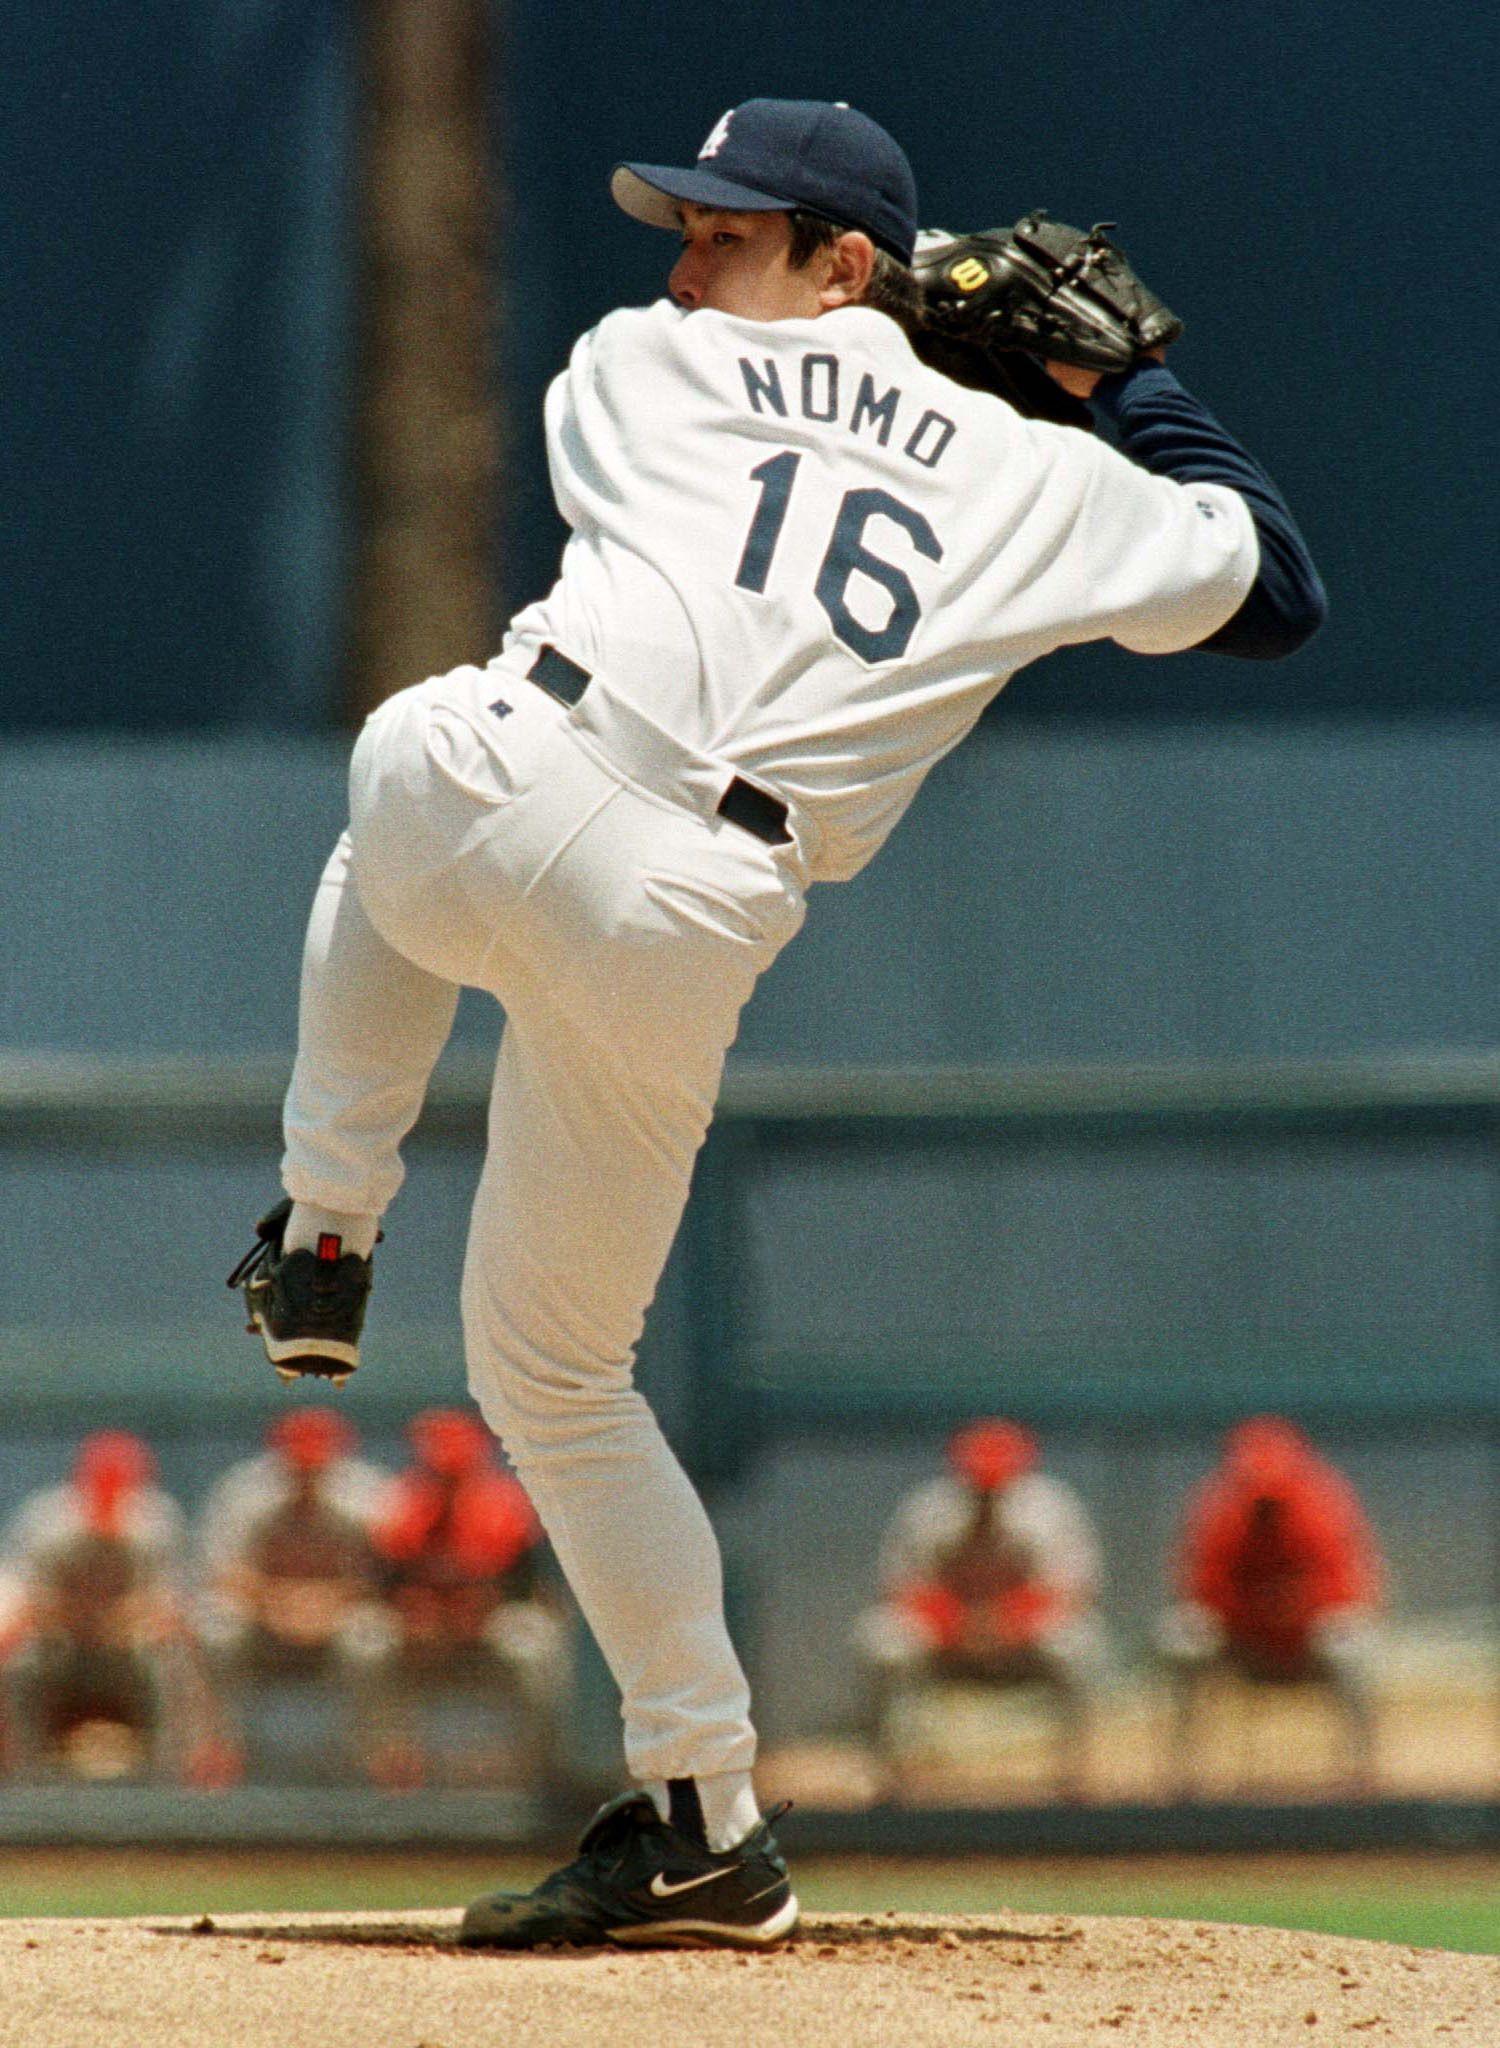 Photo of 【平成の記憶・野球編】野茂英雄からイチローへと渡った一個のサインボール(THE PAGE) – Yahoo!ニュース